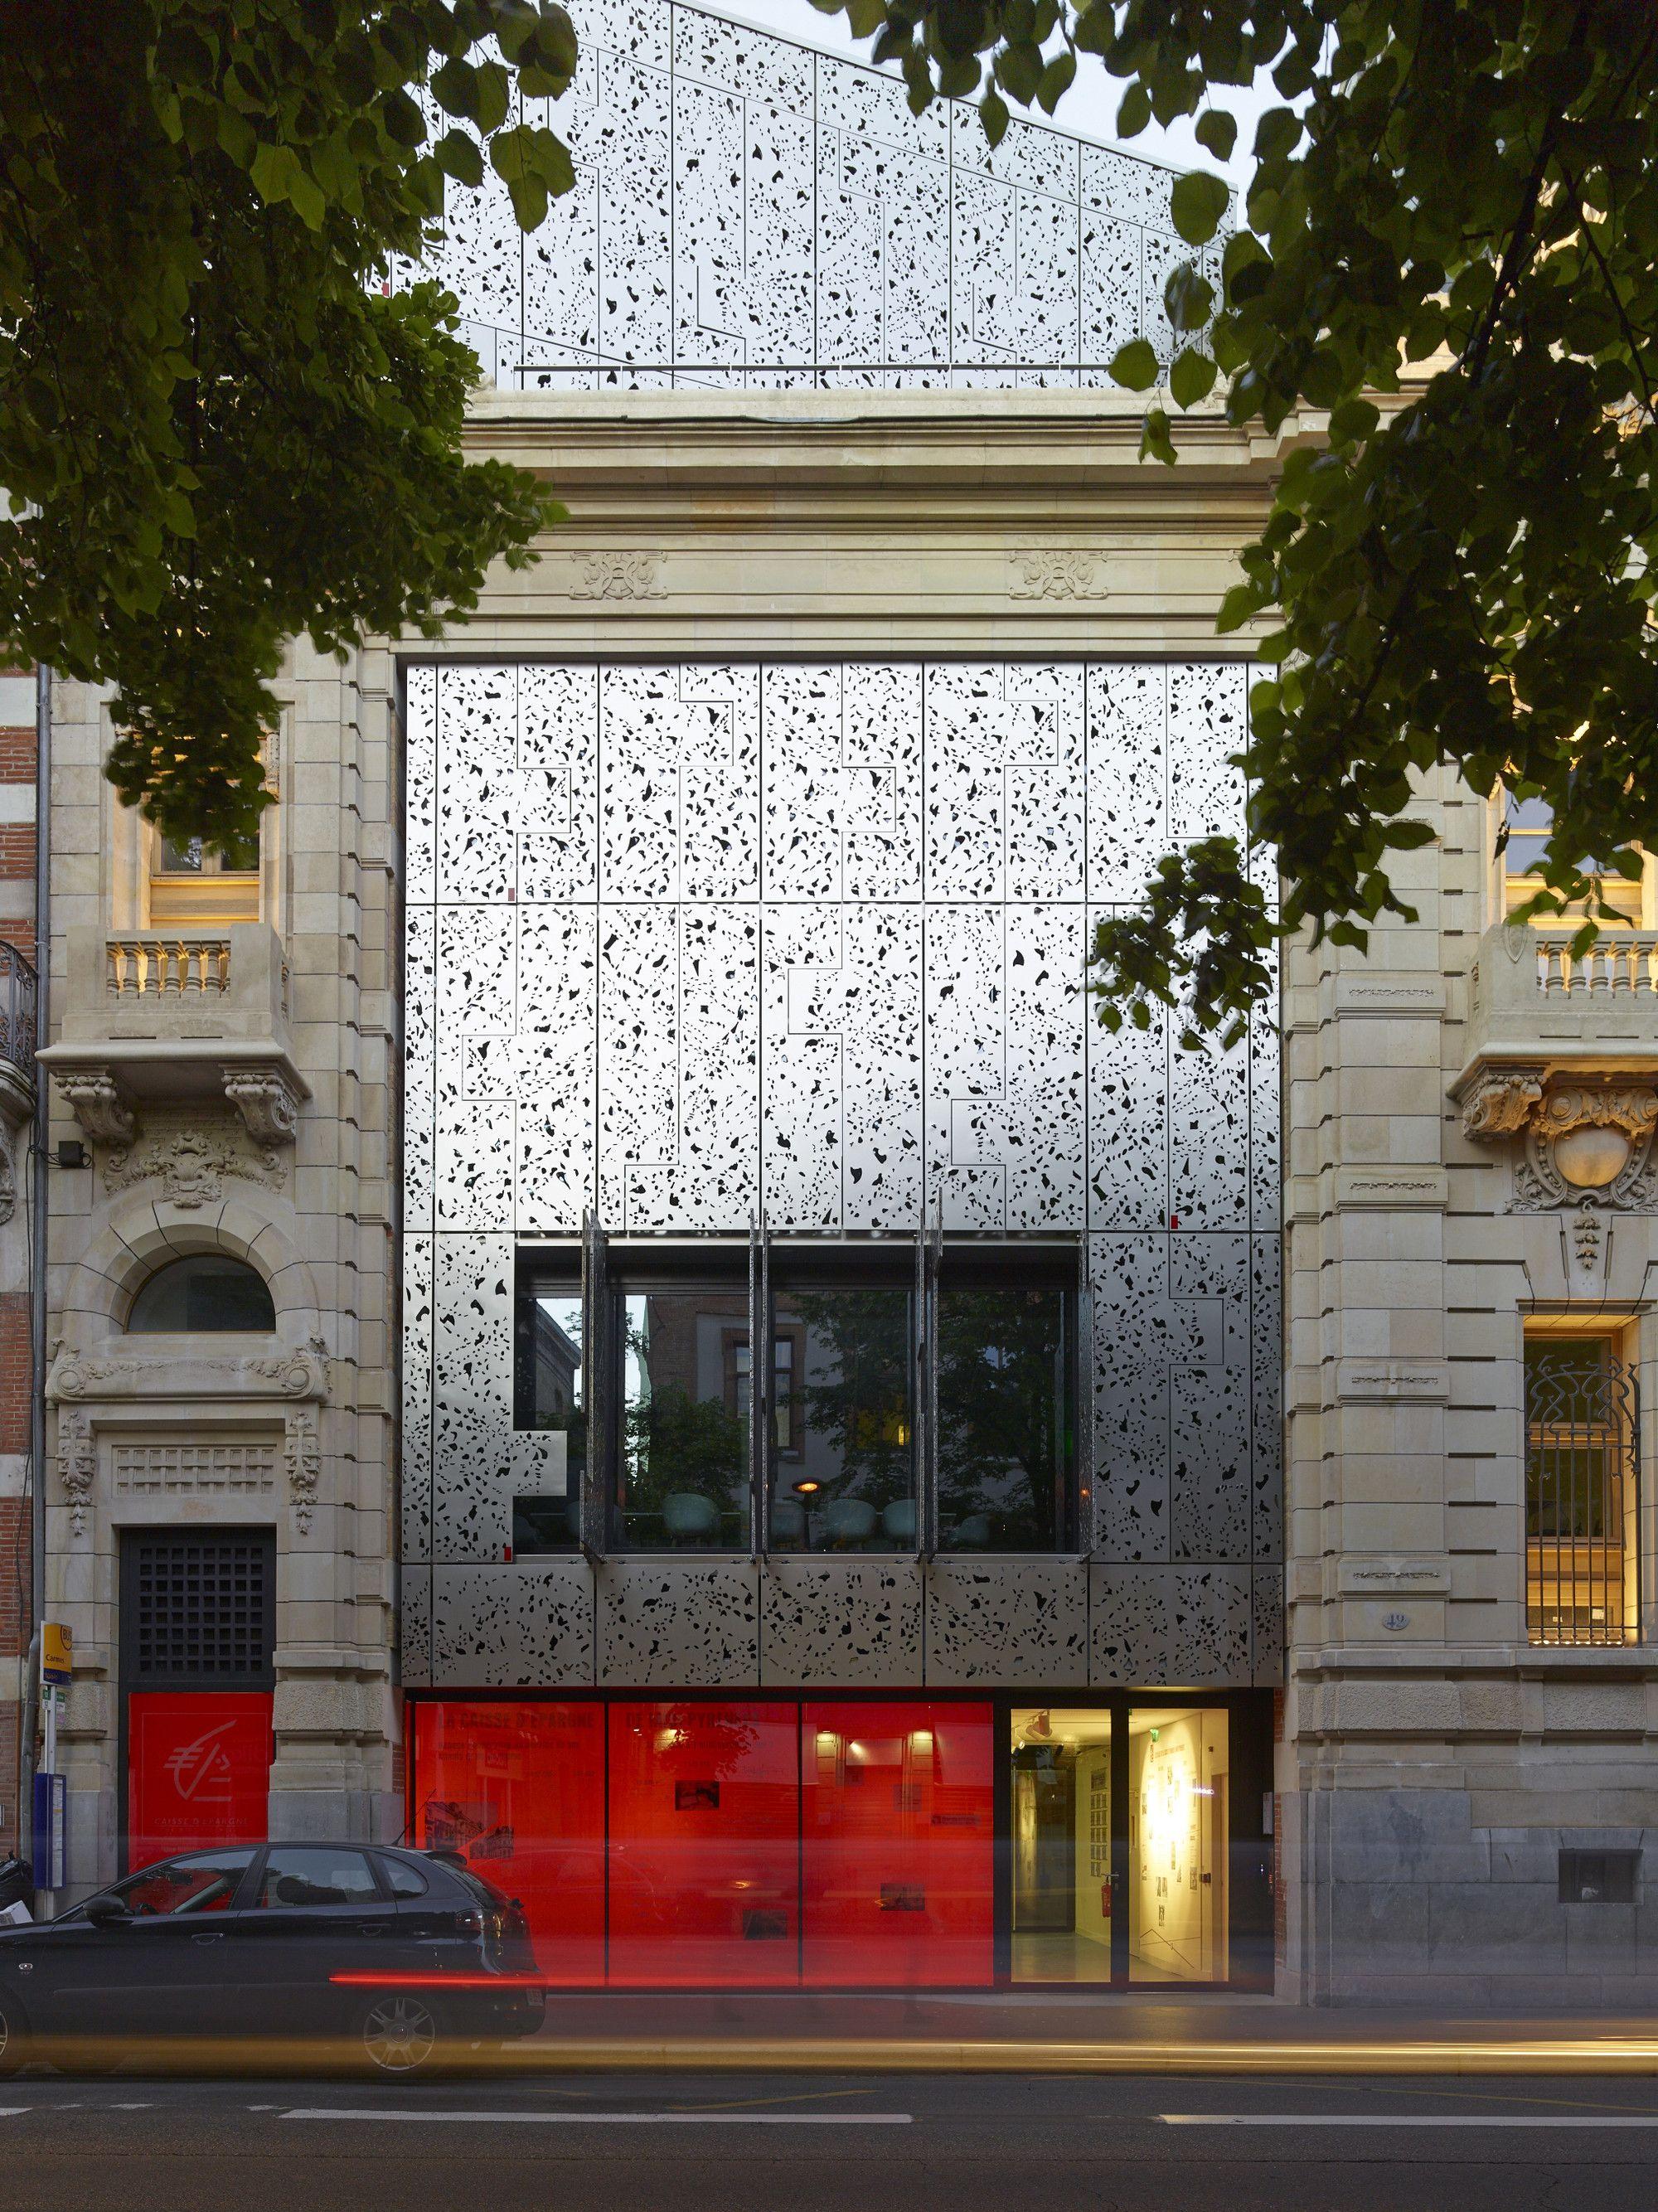 gallery of caisse d epargne headquarters taillandier architectes associ s 1 pinterest. Black Bedroom Furniture Sets. Home Design Ideas